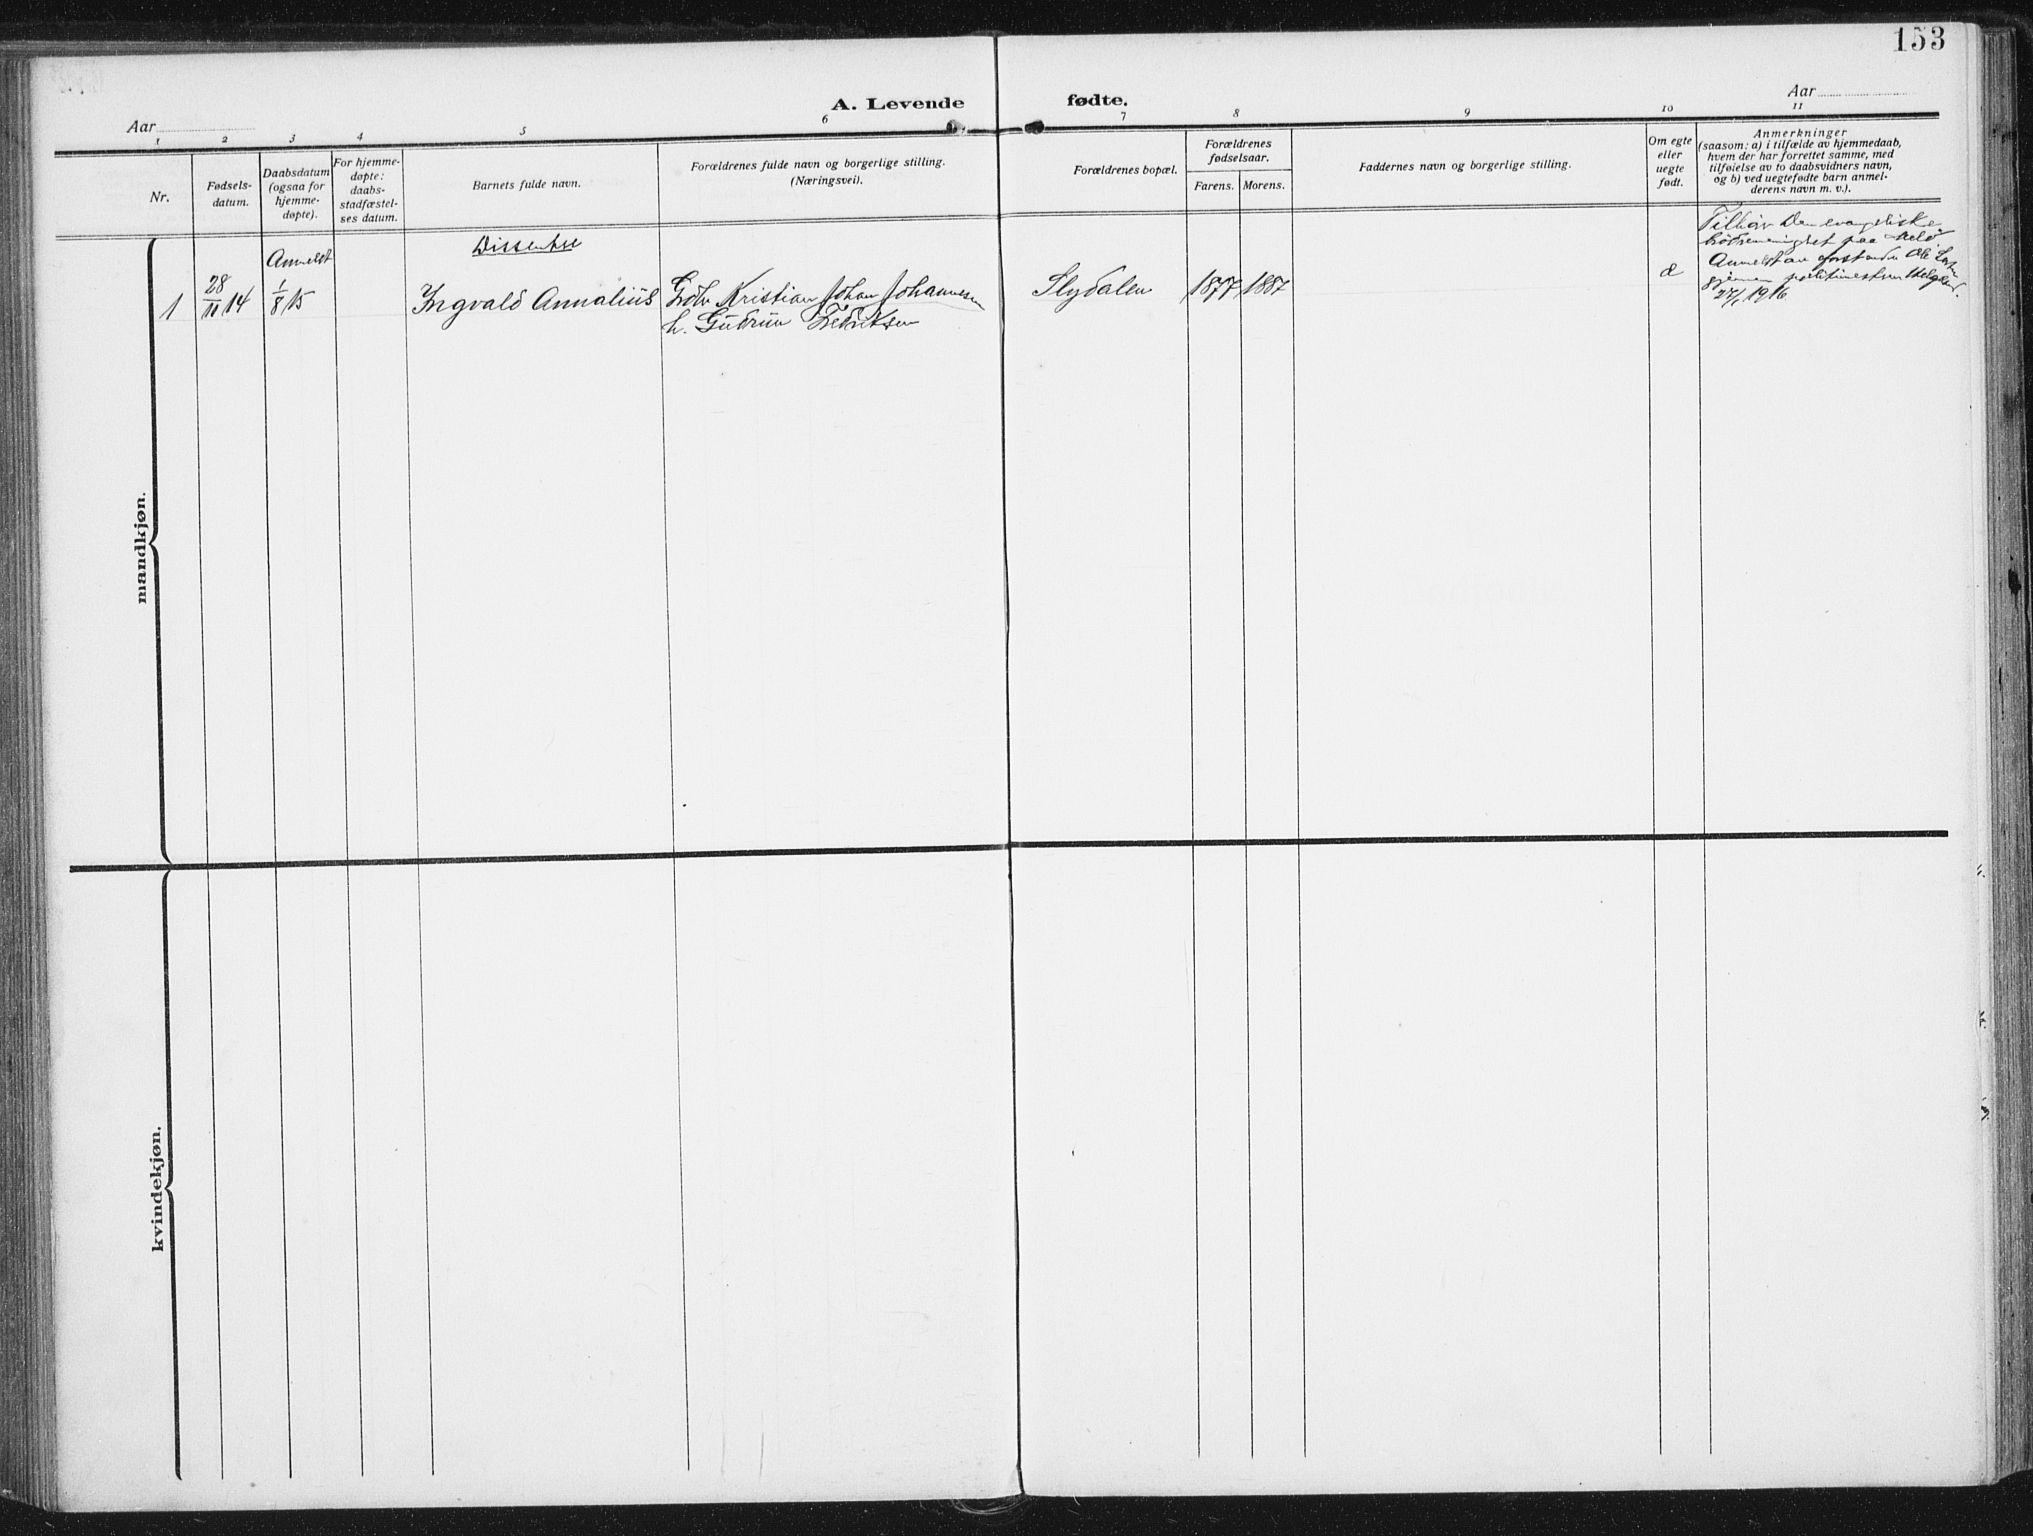 SAT, Ministerialprotokoller, klokkerbøker og fødselsregistre - Nordland, 880/L1135: Ministerialbok nr. 880A09, 1908-1919, s. 153